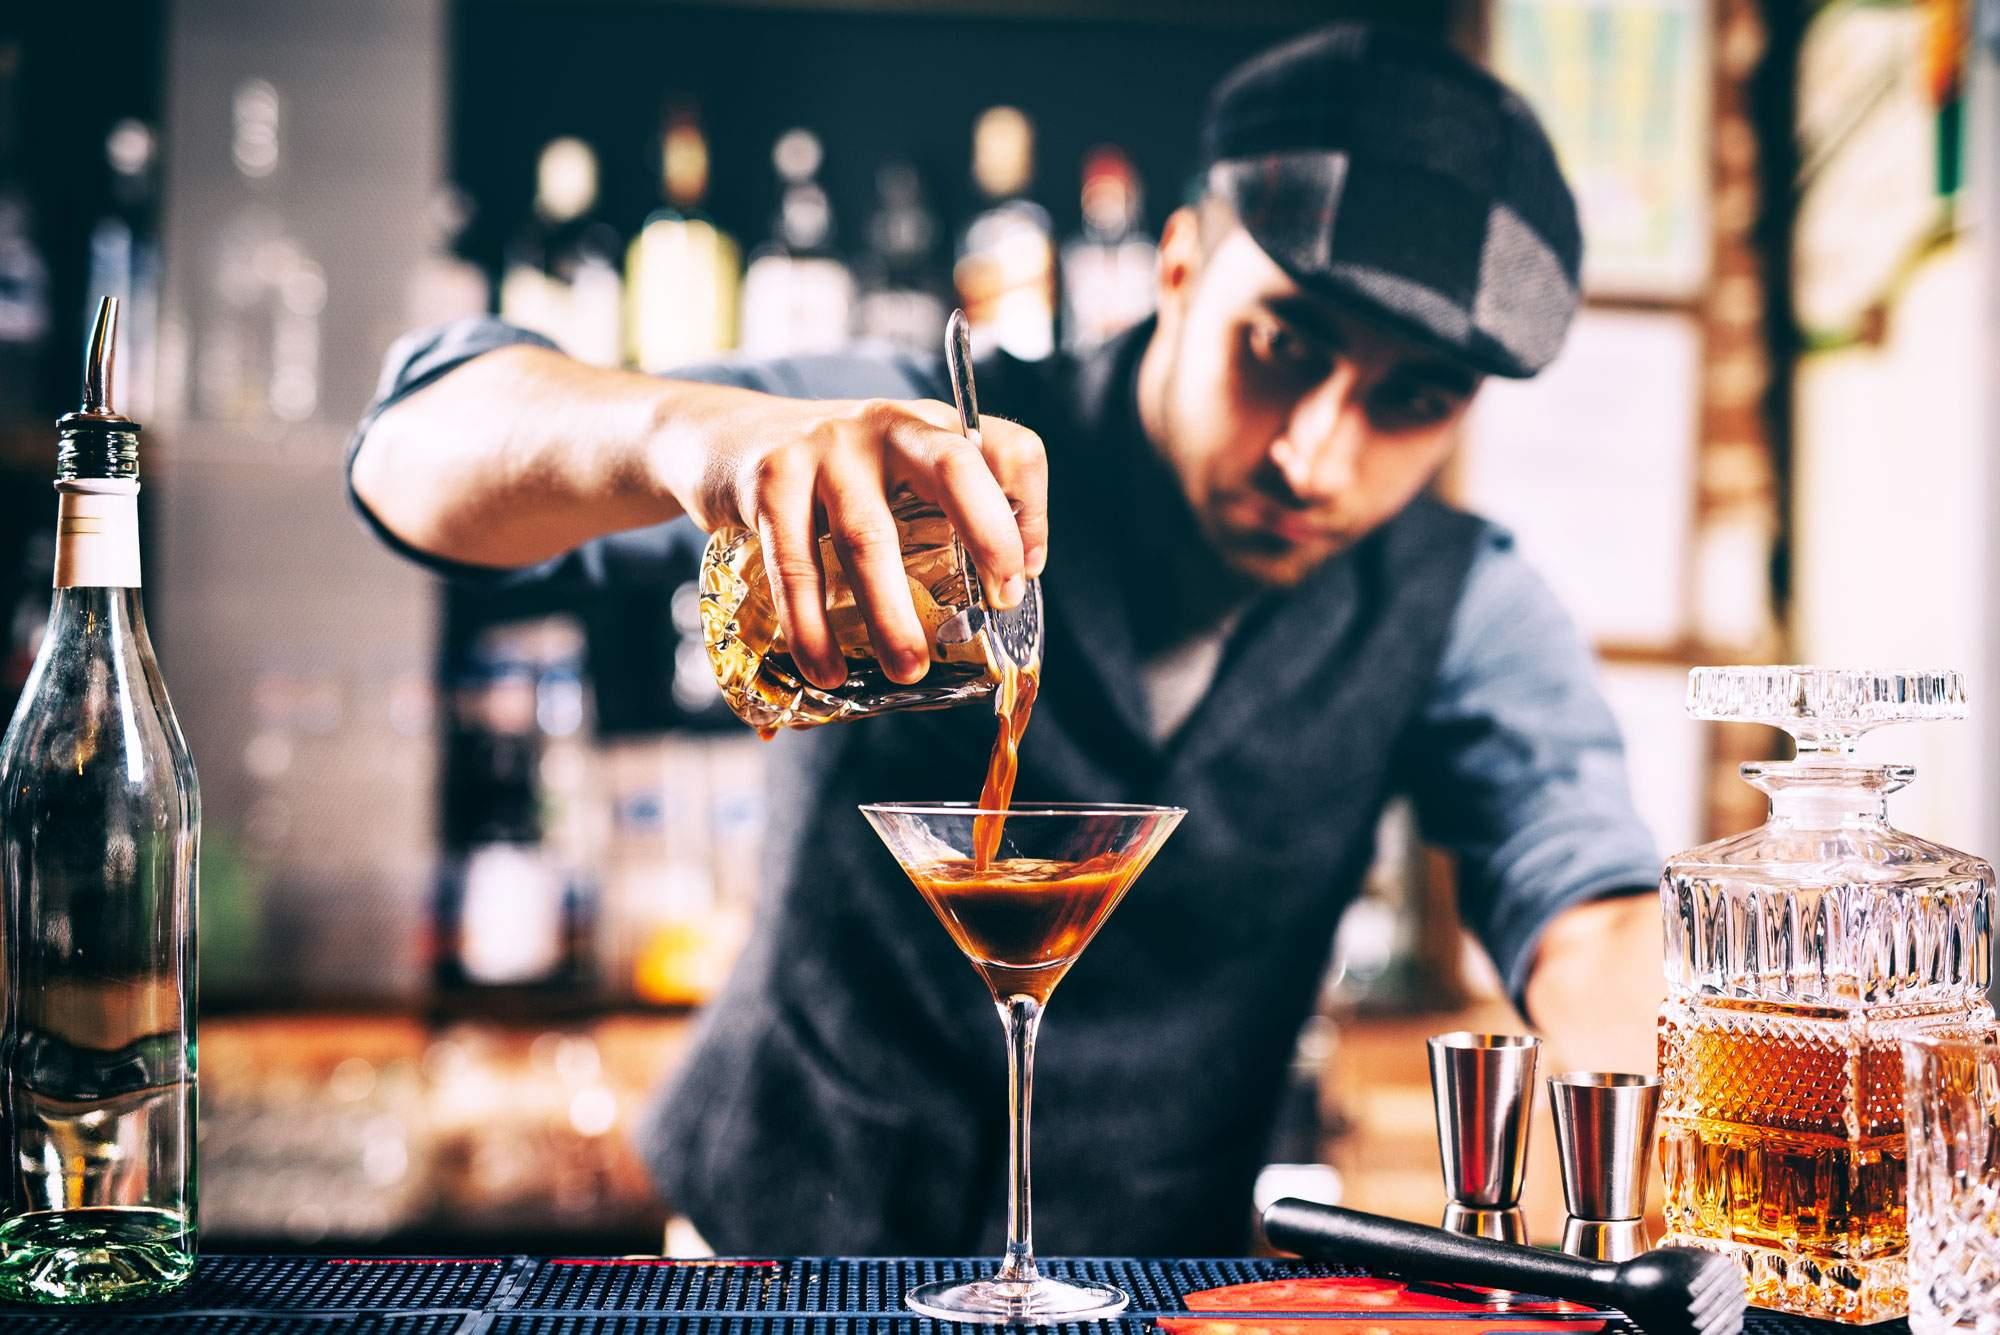 bartender-drink-bar-sorrento-amalfi-coast